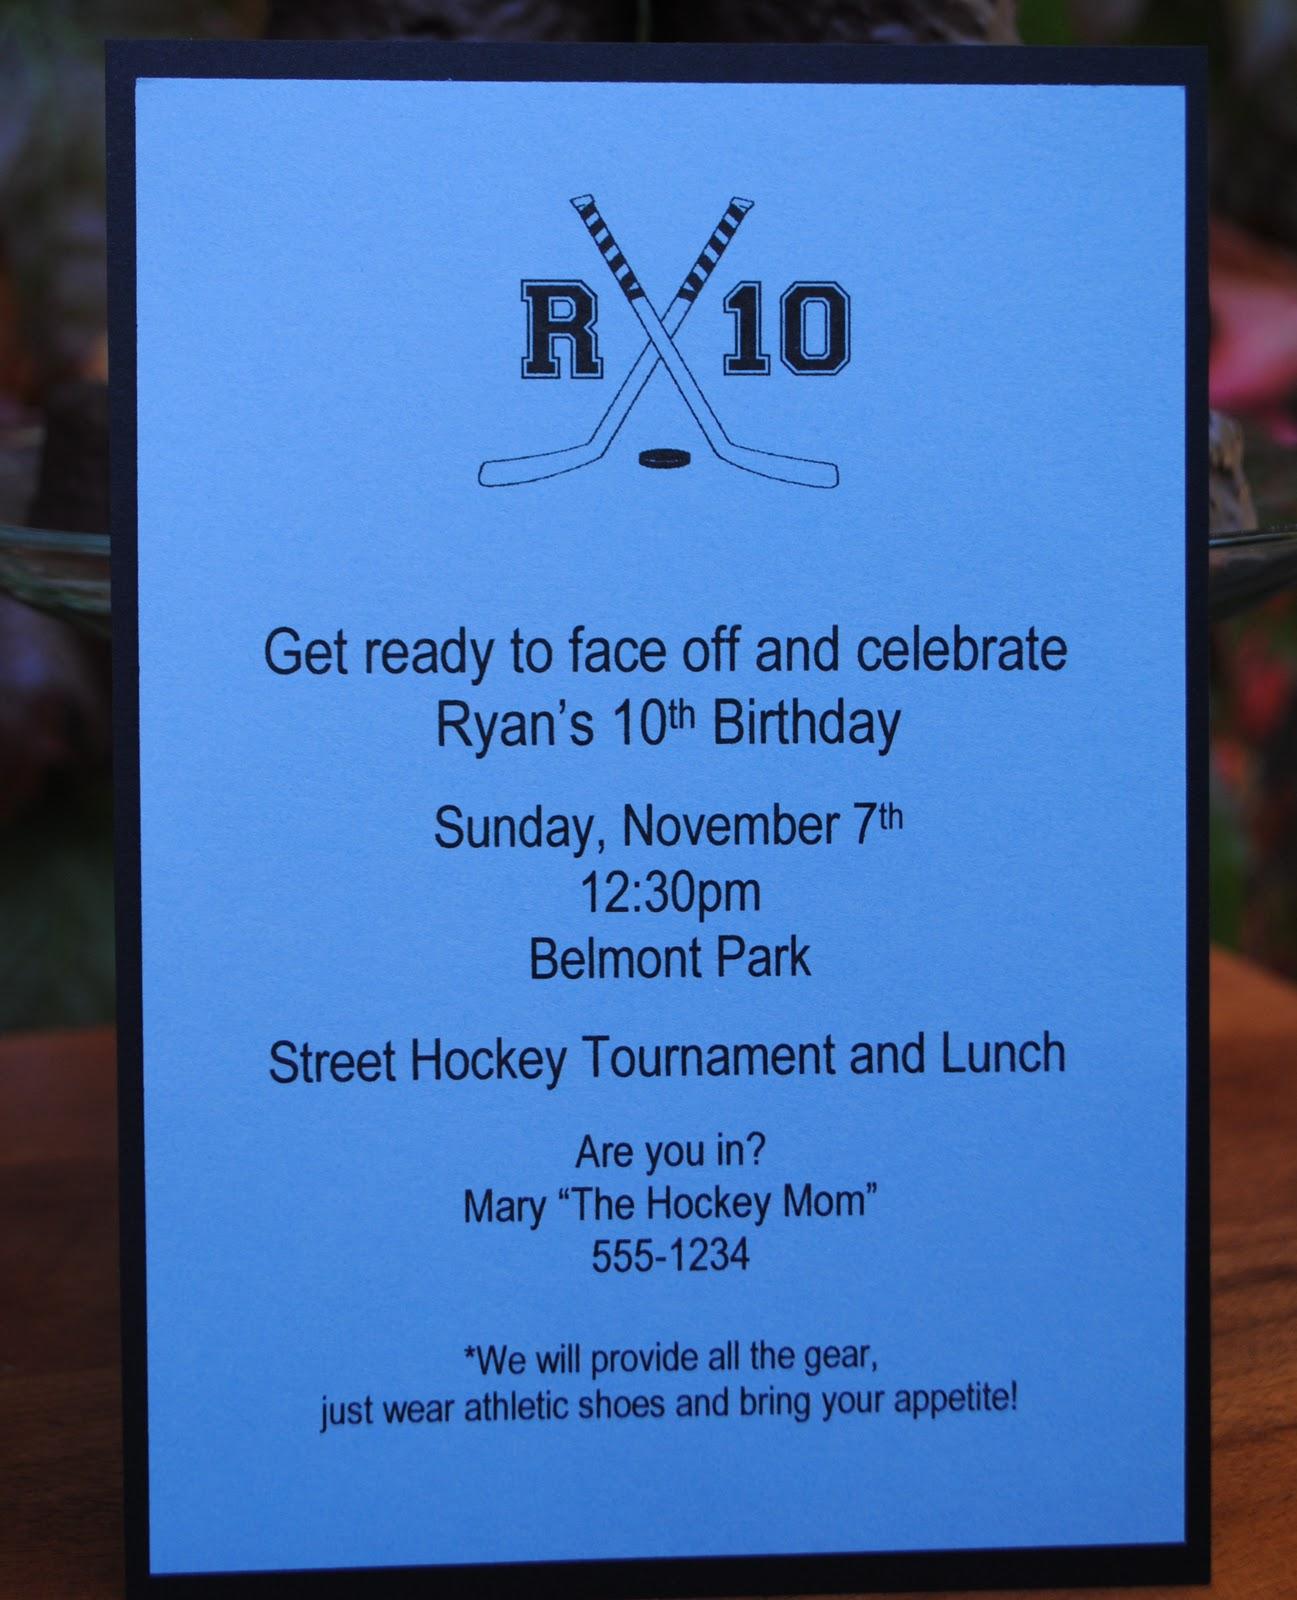 Jac o lyn Murphy A Hockey Party and Special Cake – Hockey Party Invitations